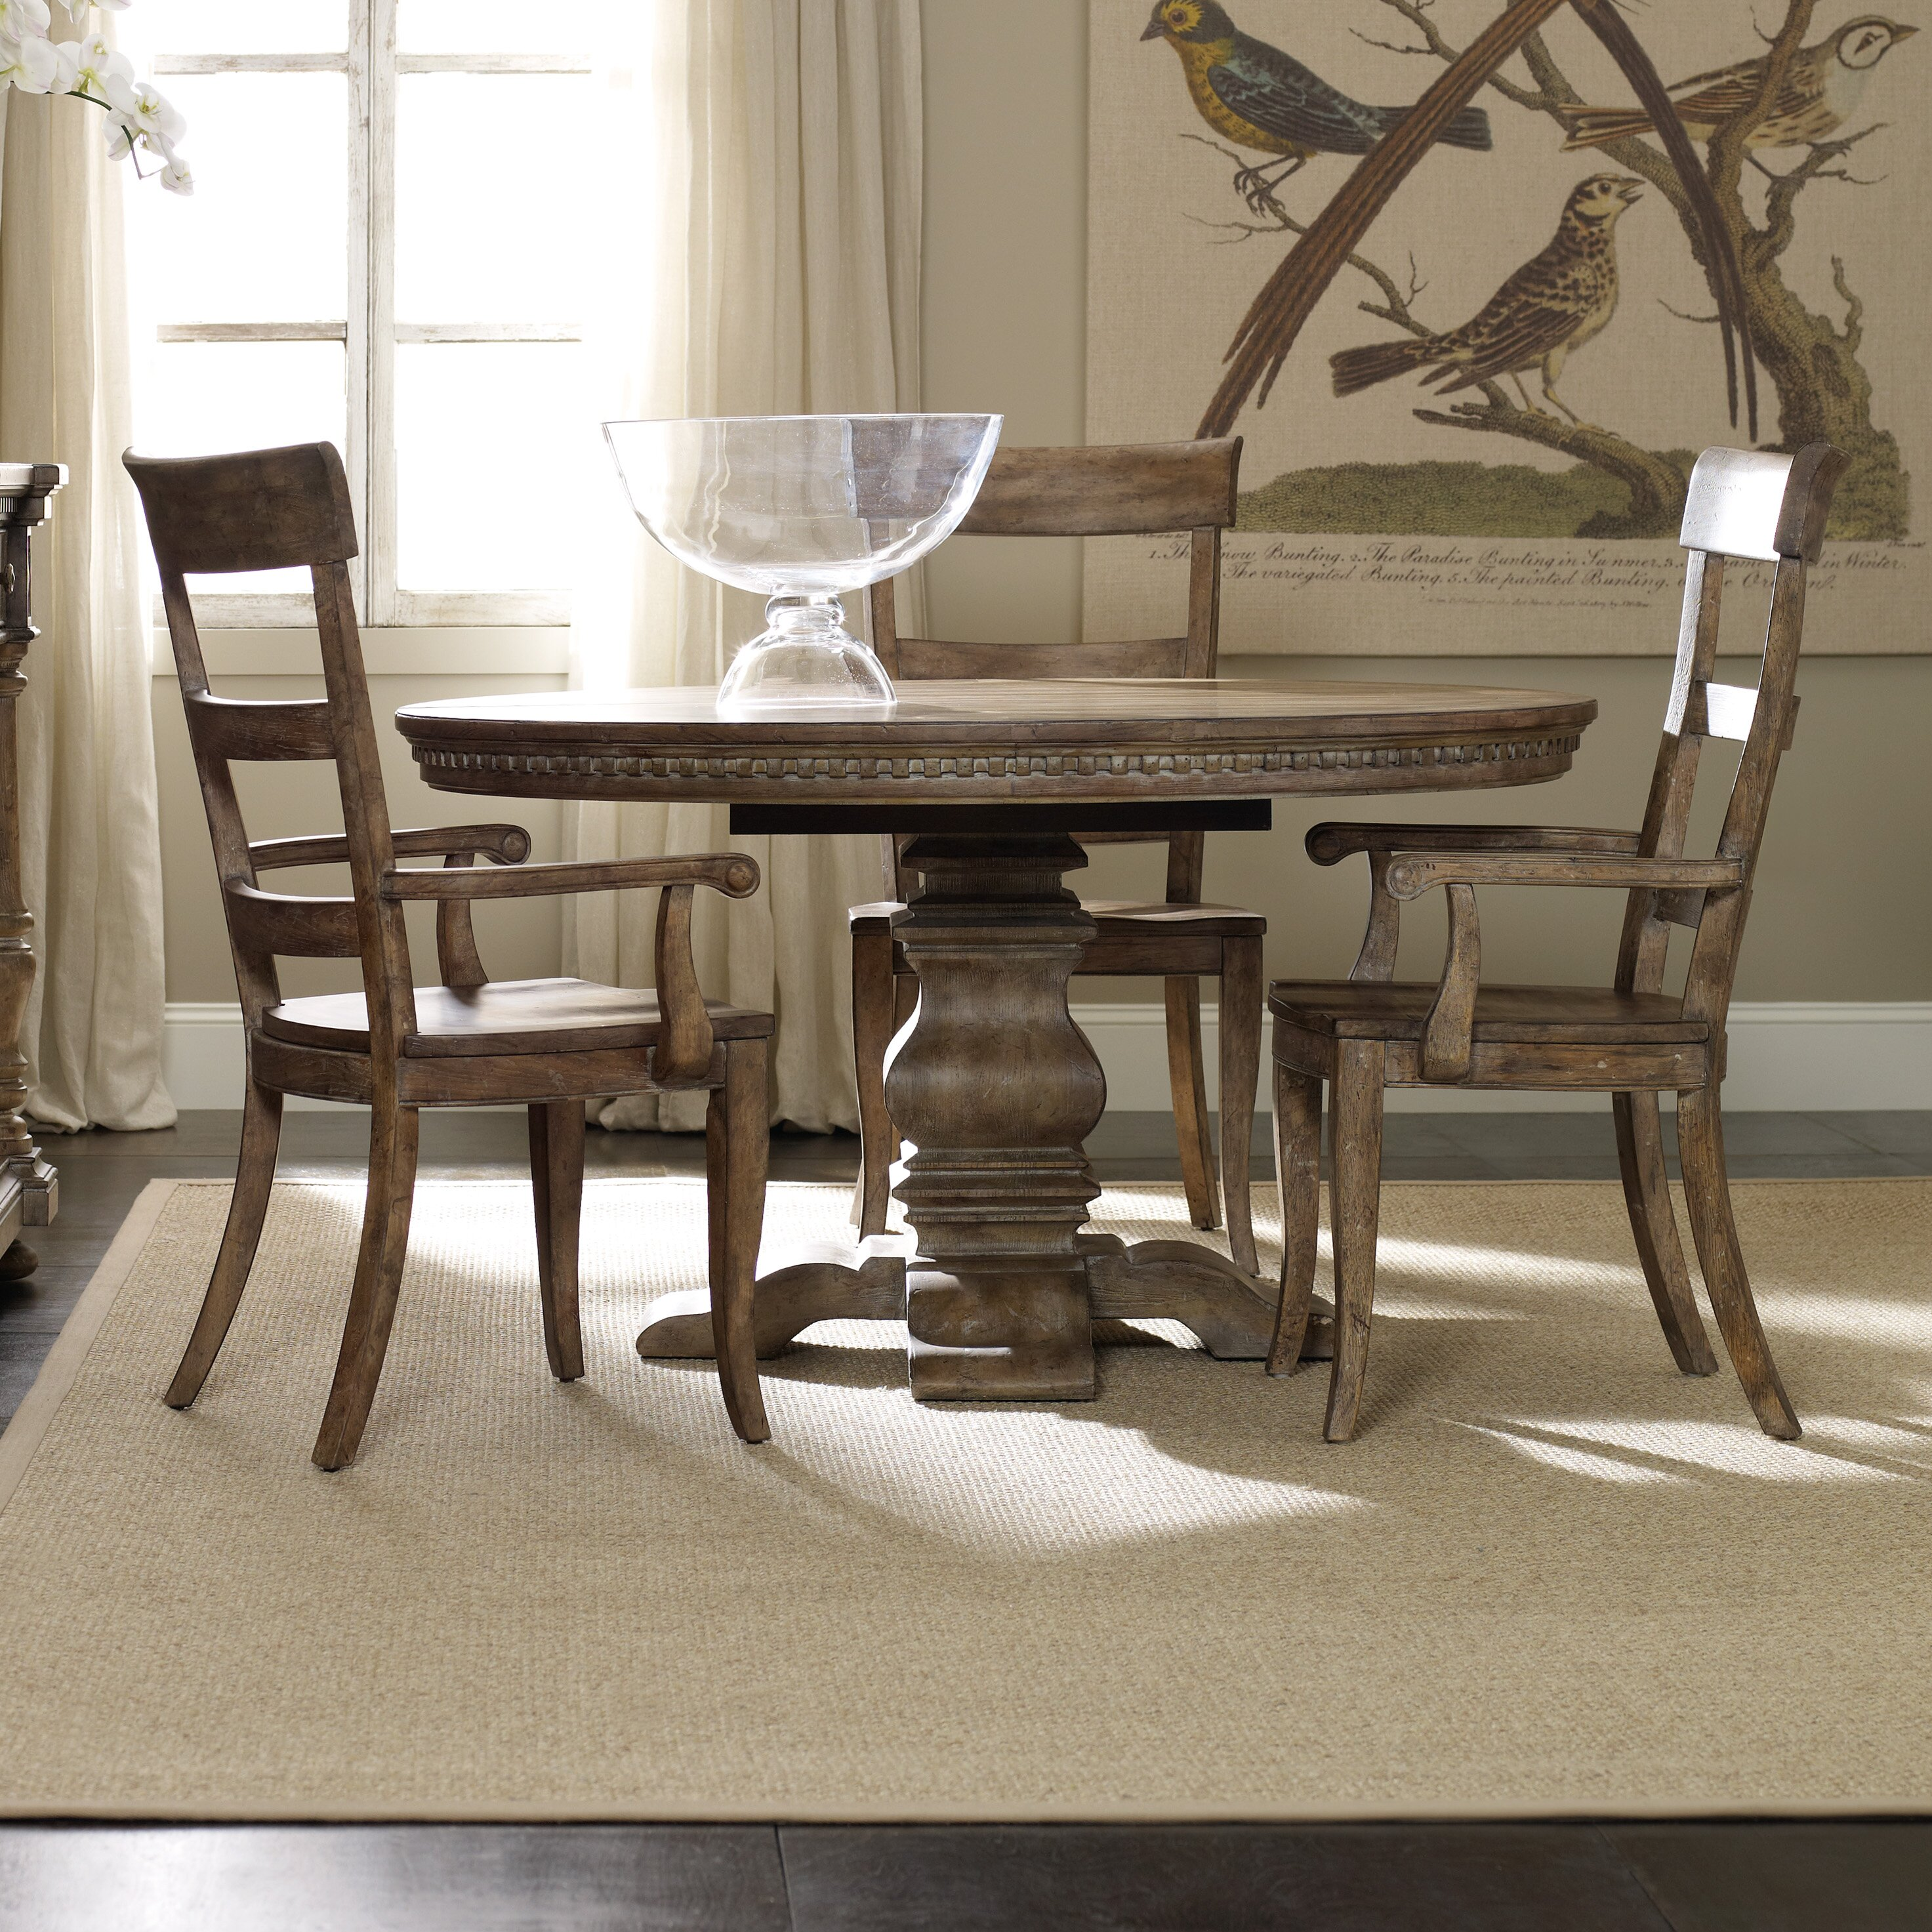 Hooker Furniture Sorella 5 Piece Dining Set amp Reviews  :  from www.wayfair.com size 2945 x 2945 jpeg 2034kB